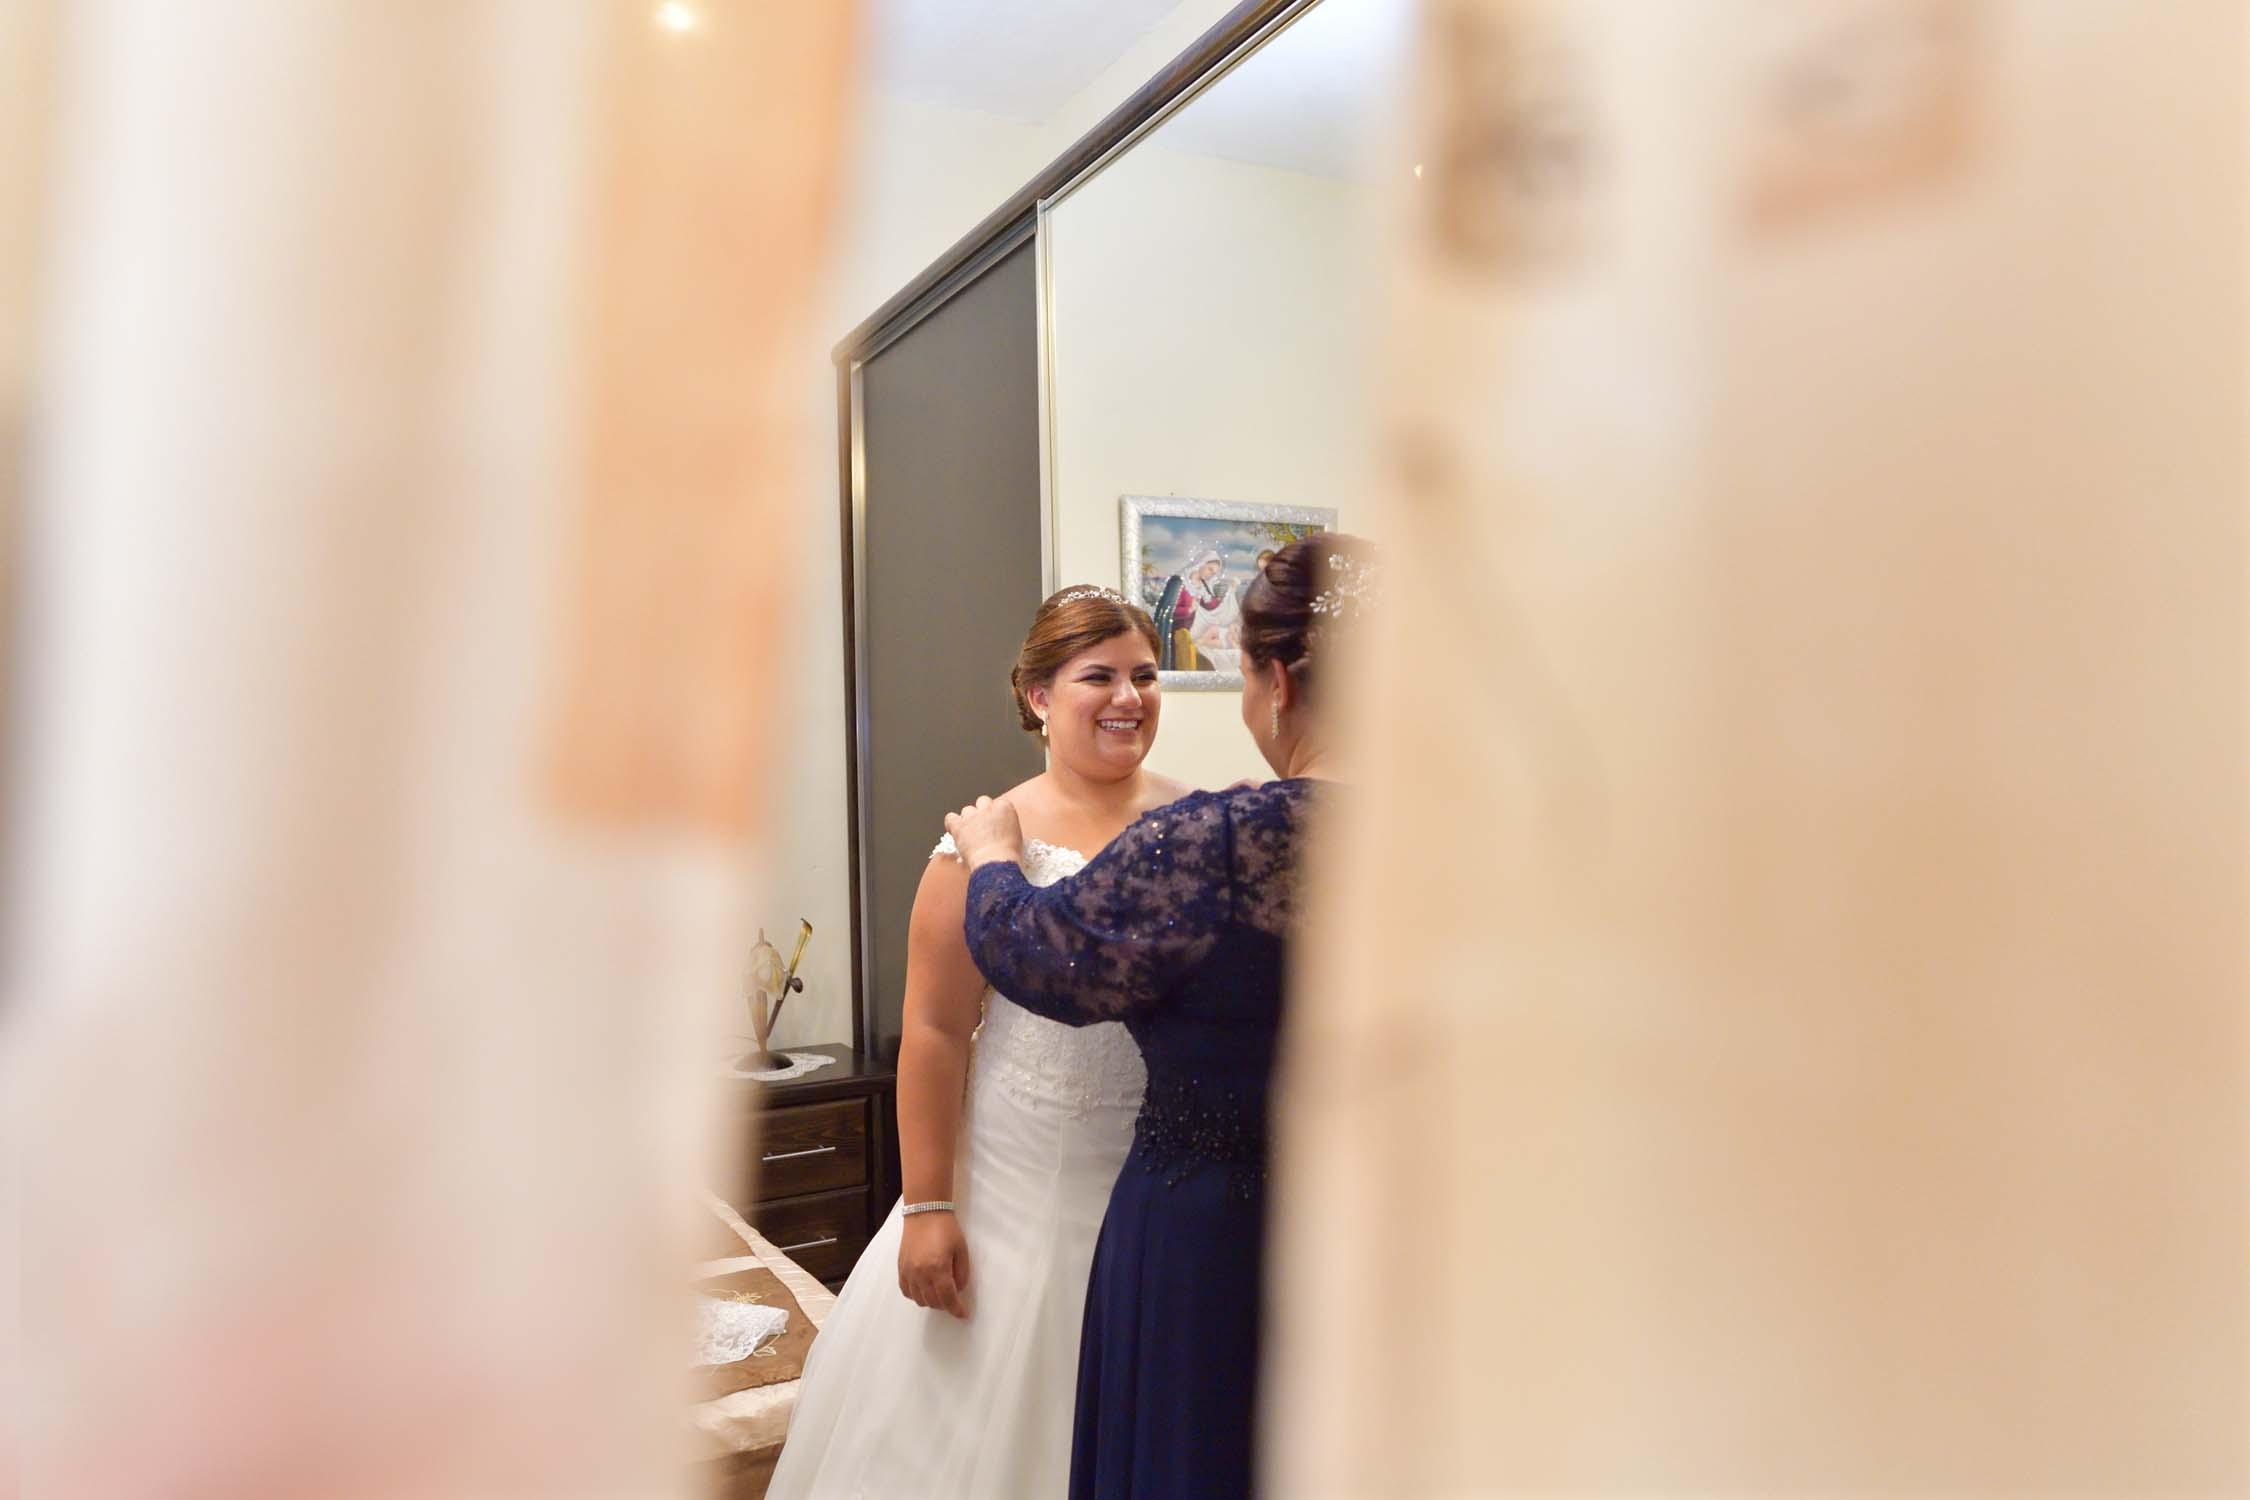 Wedding Photography in Gozo and Malta